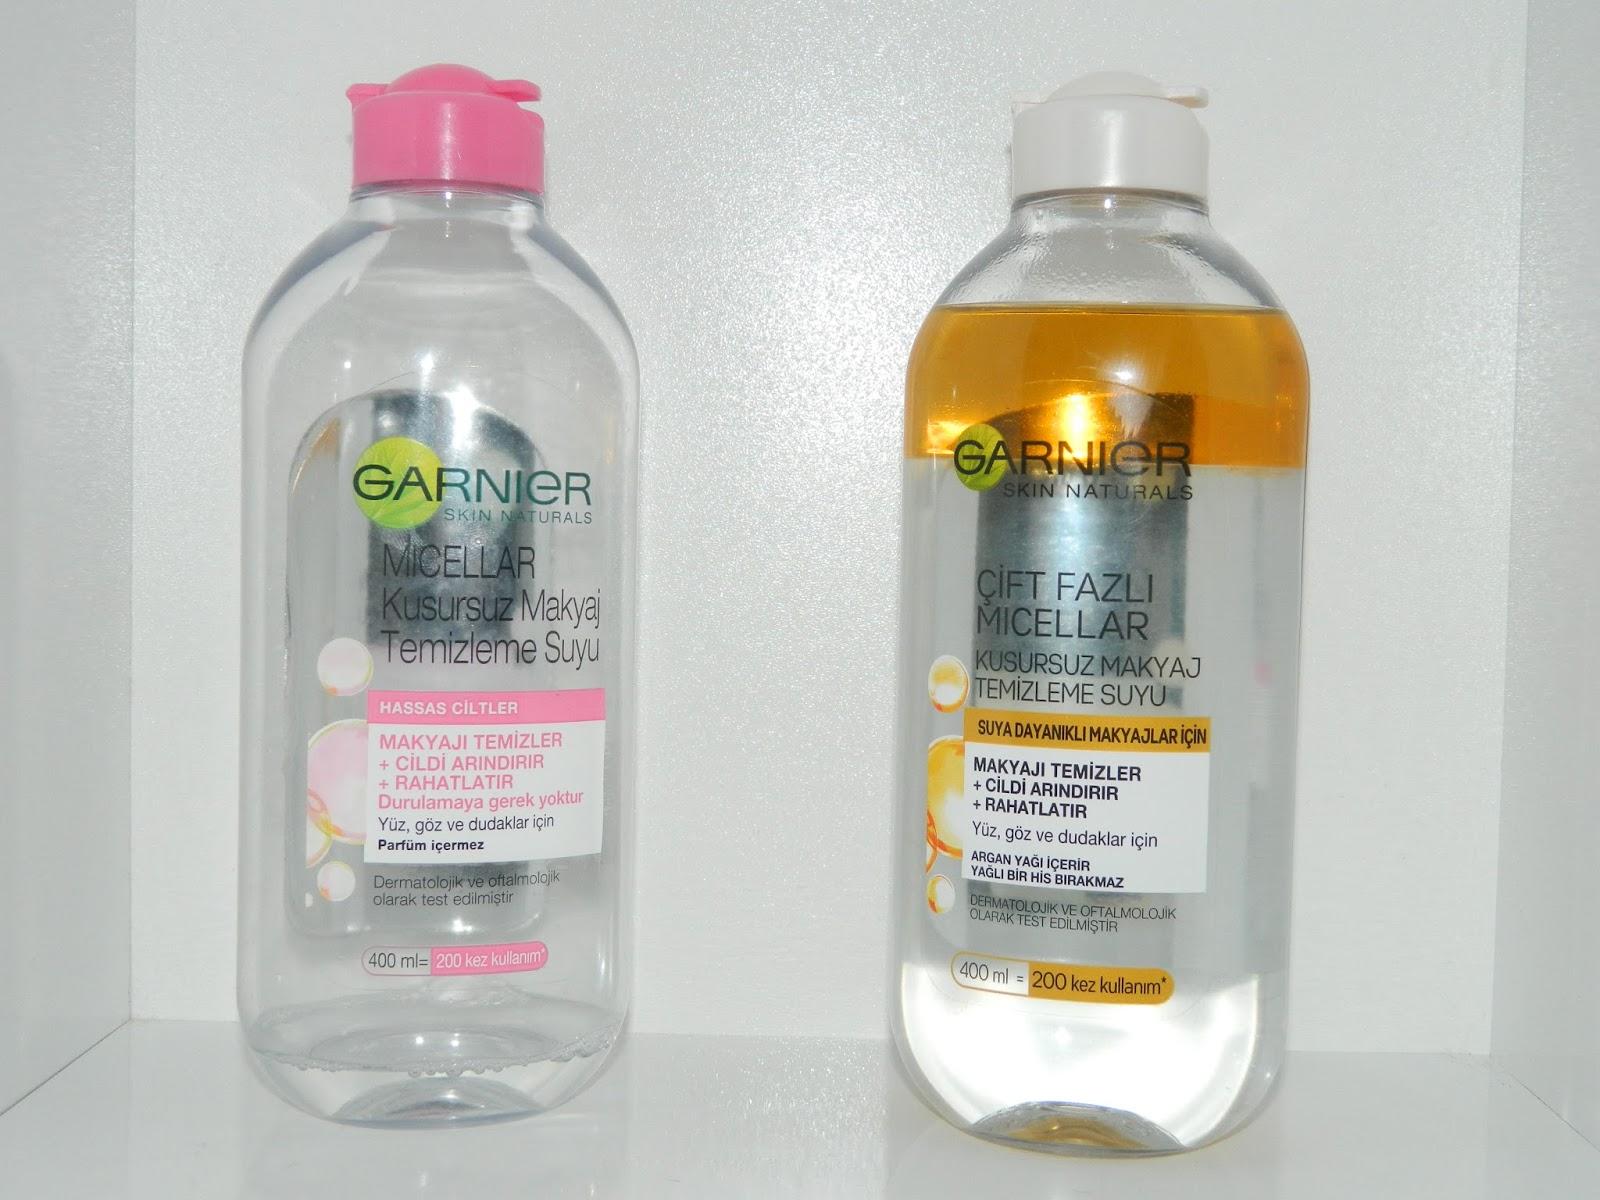 Garnier Makyaj Temizleme Suyu